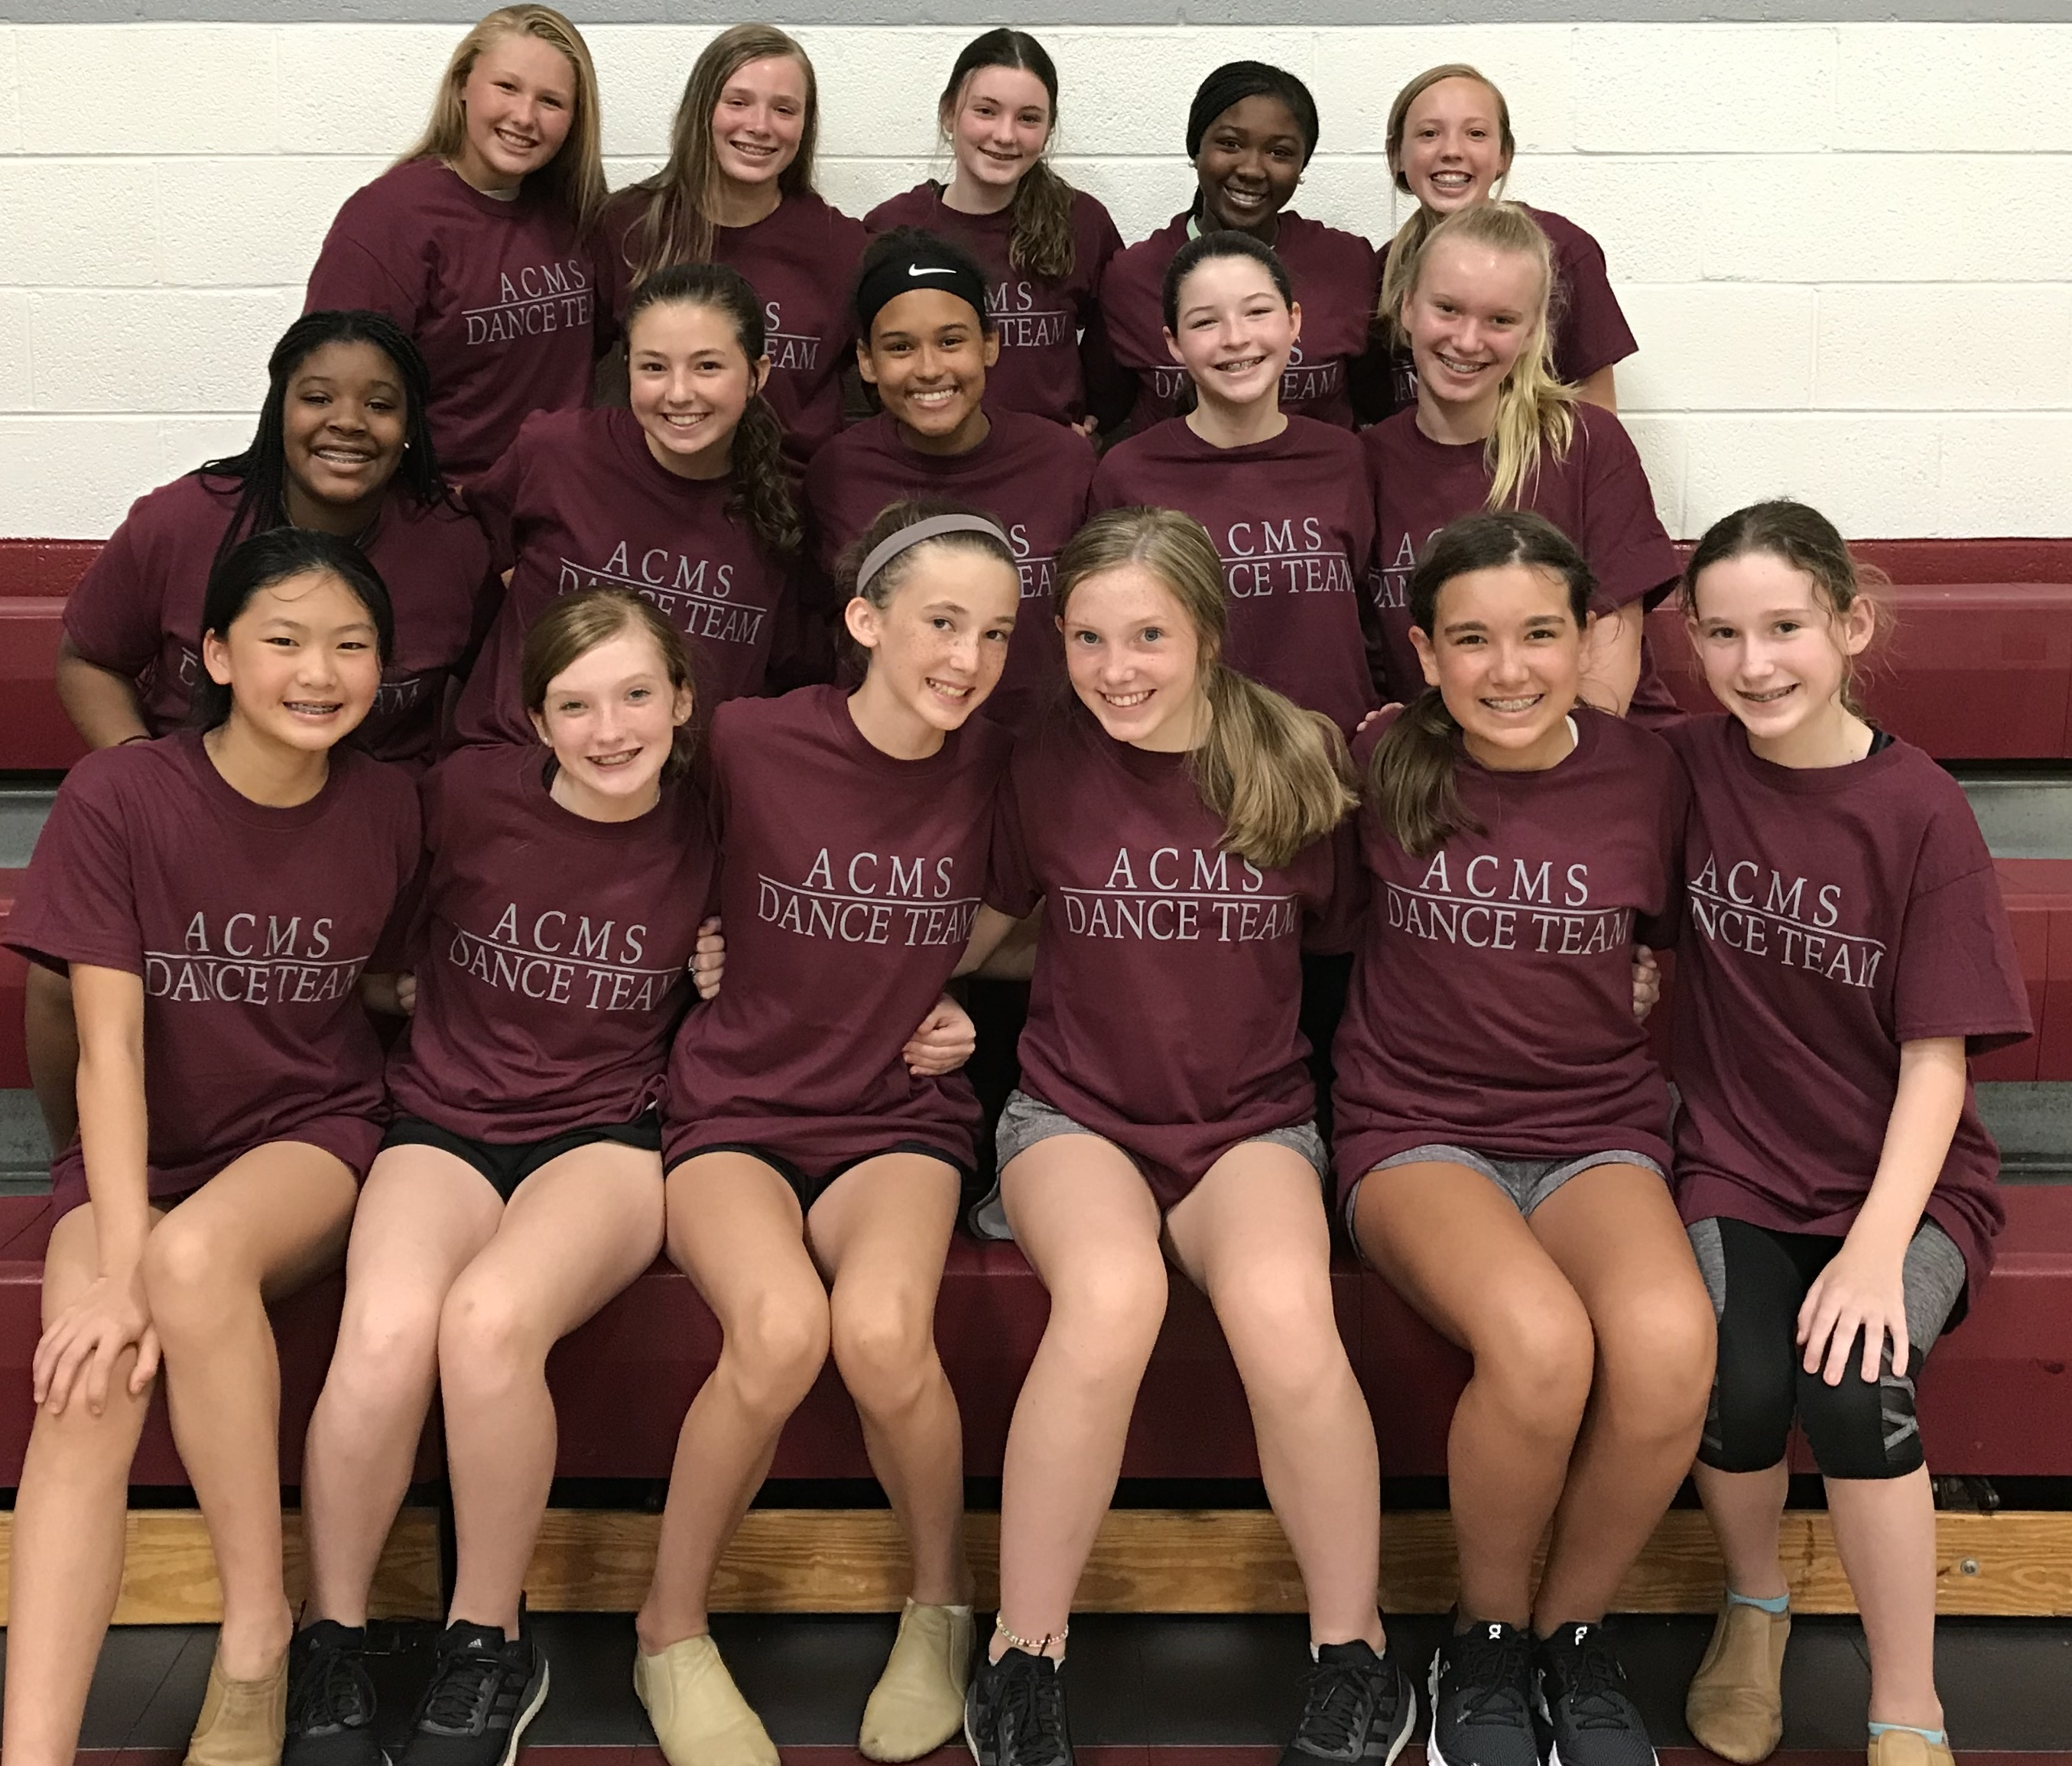 ACMS Dance Team Camp Fee Payment #3